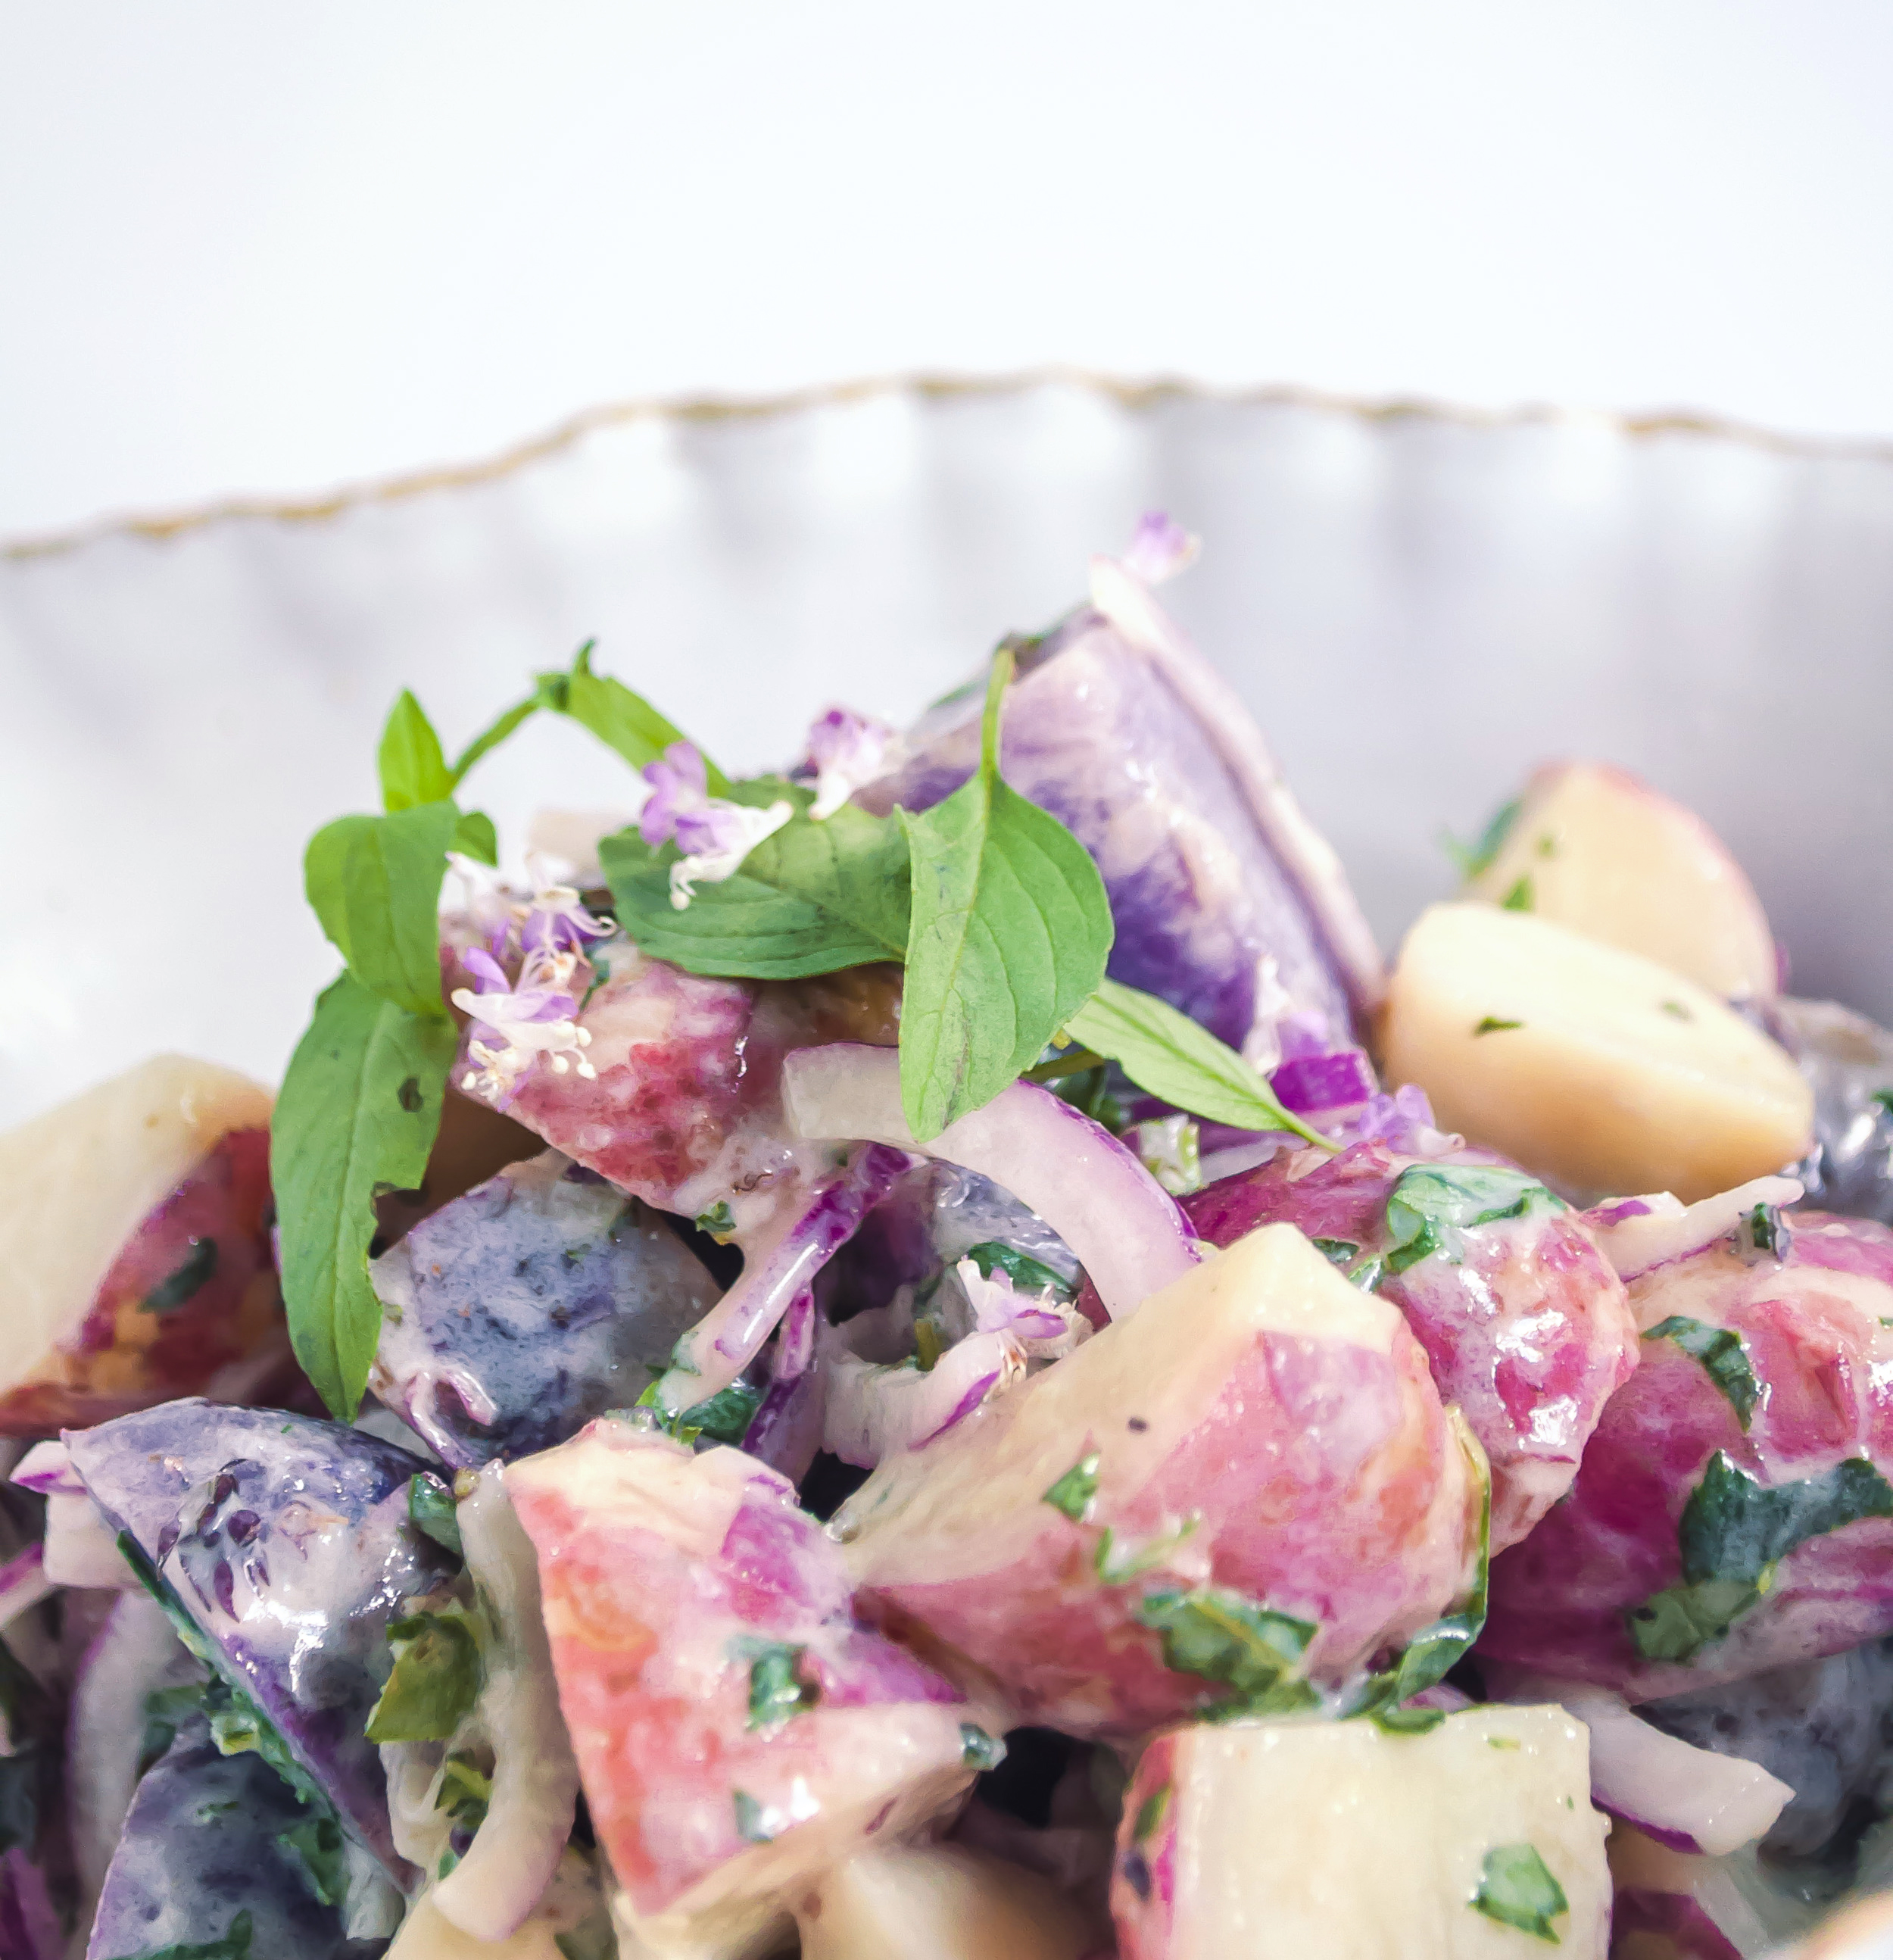 Purple and Red Potato Salad with Thai Basil Yogurt Dressing